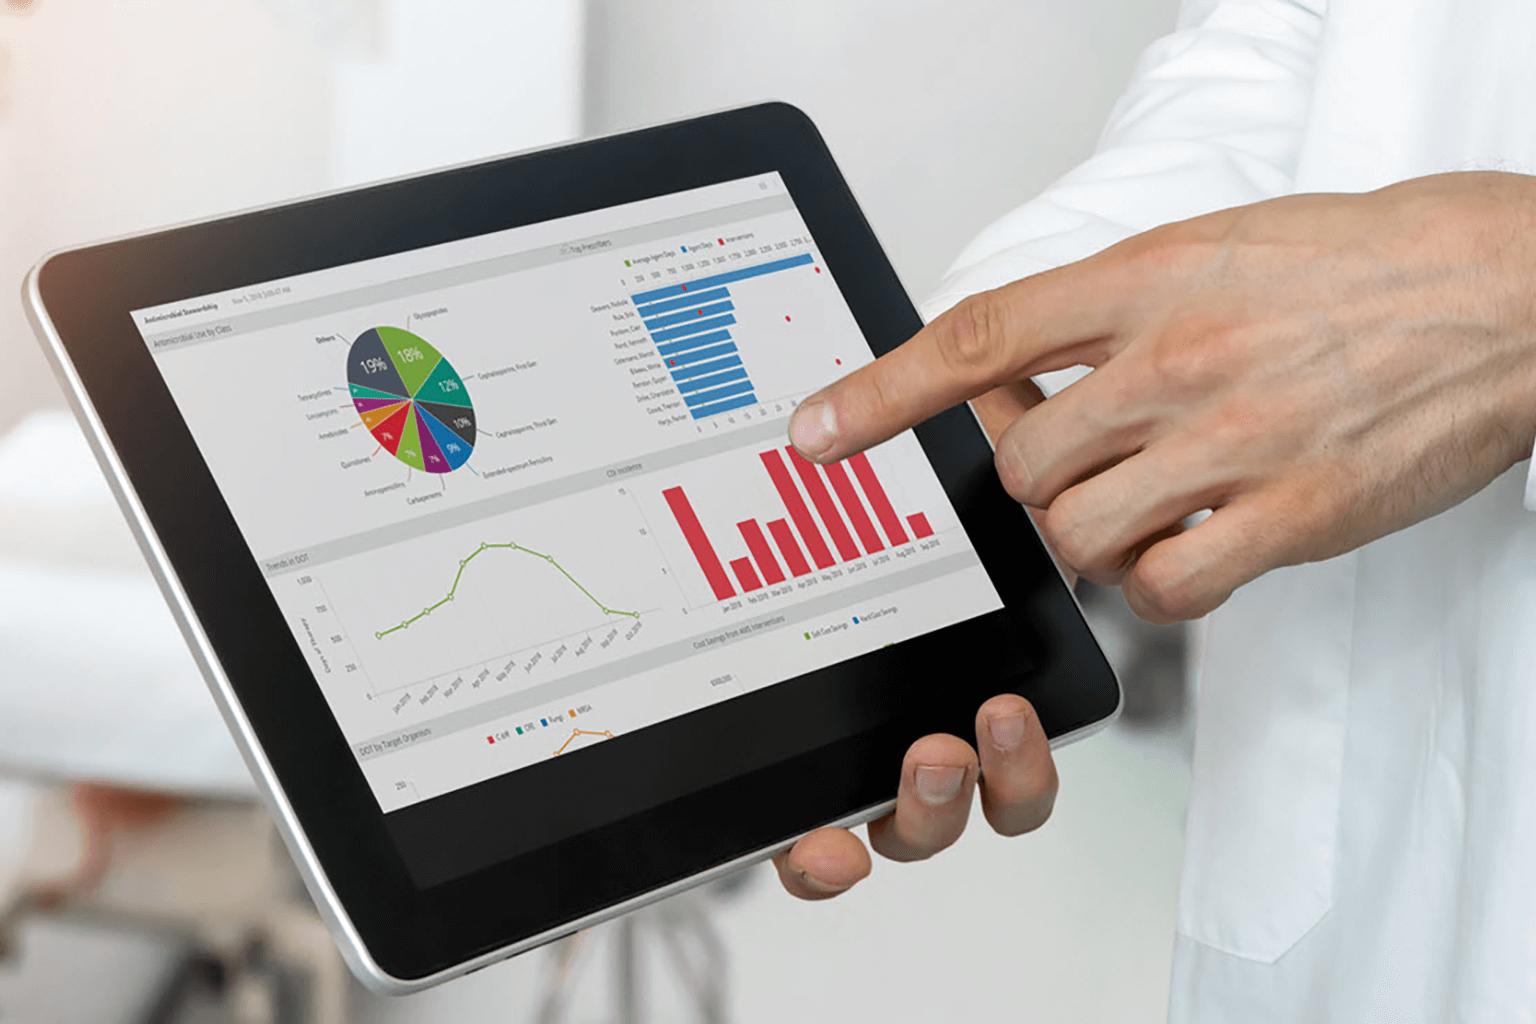 sentri7-analytics-pharmacy-on-tablet-mobile-friendly